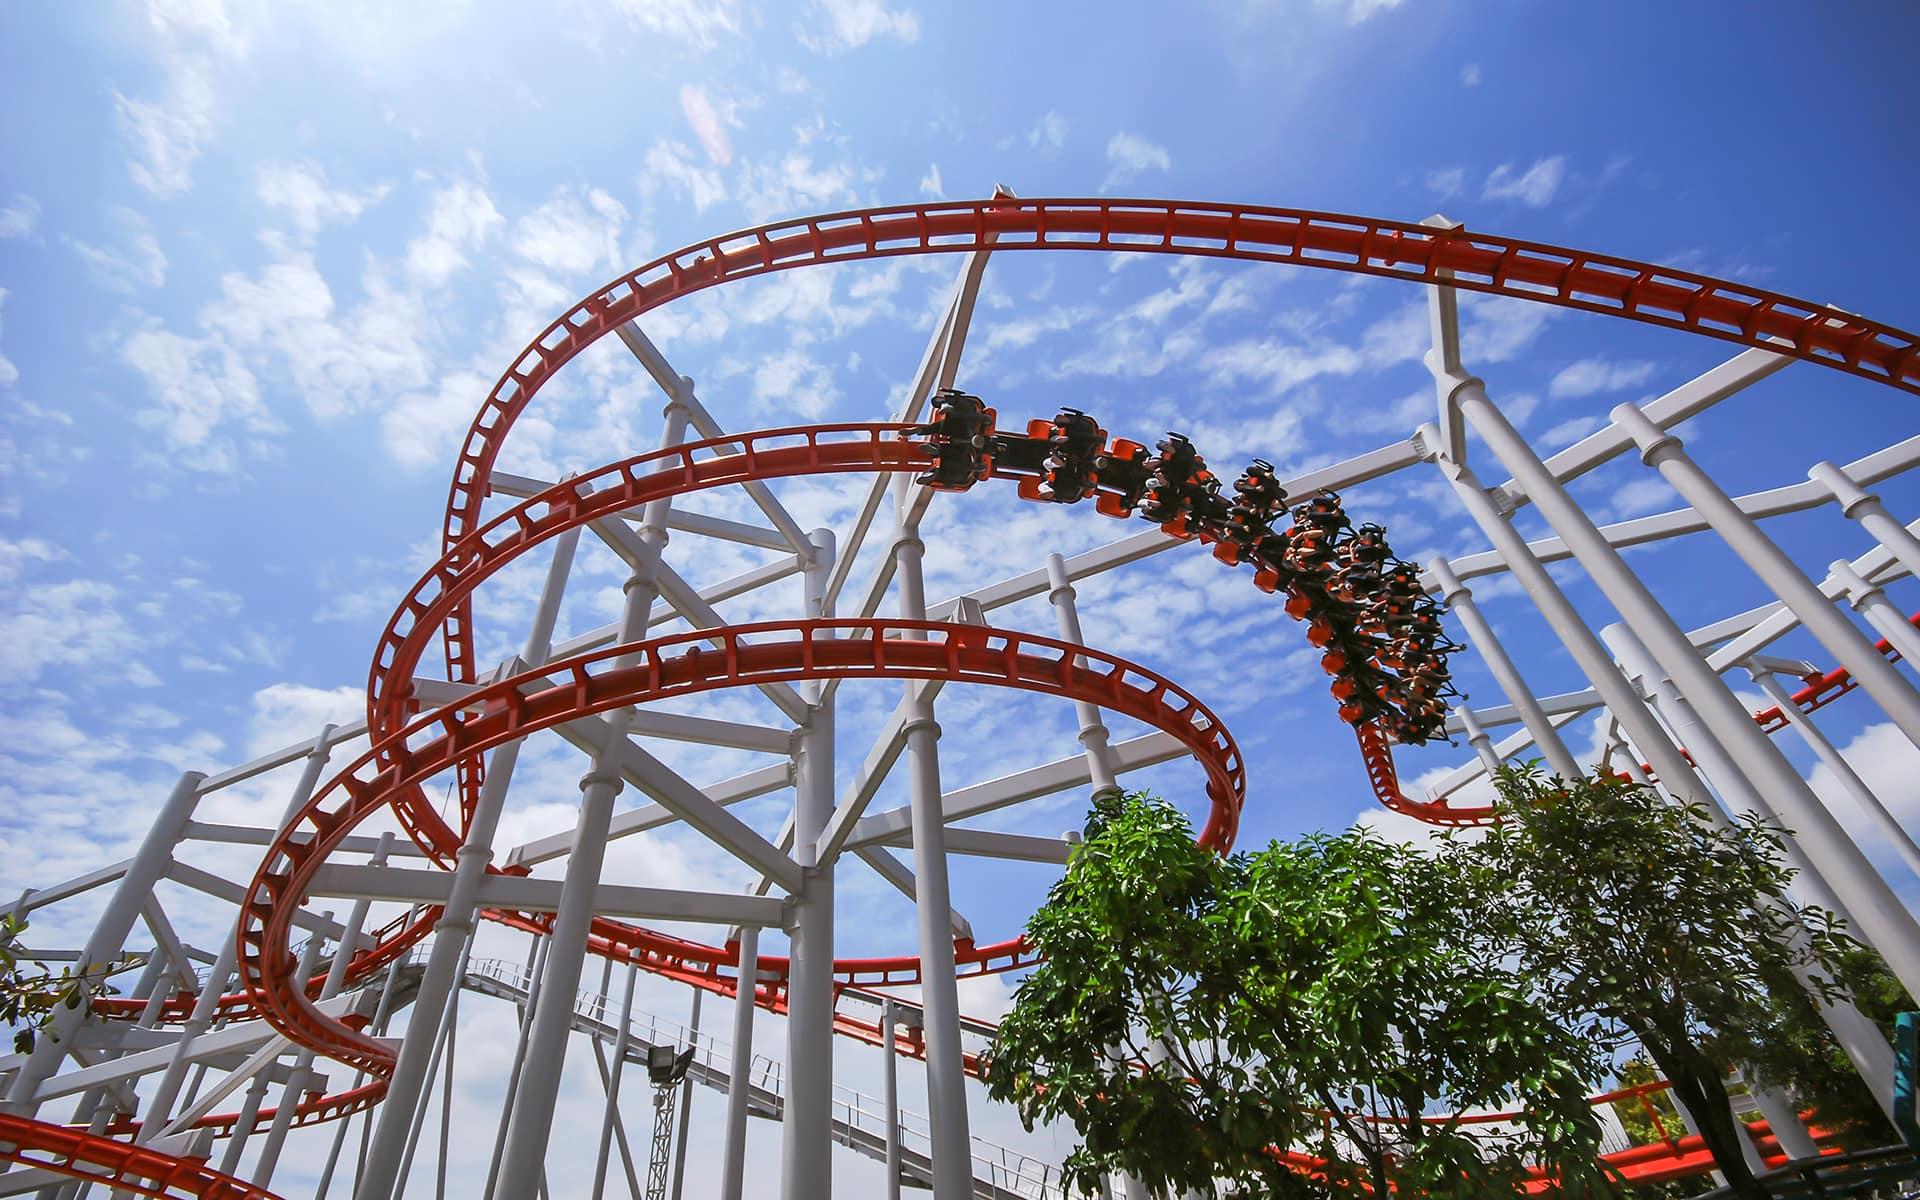 Signavio BPMN Roundtrip - rollercoaster